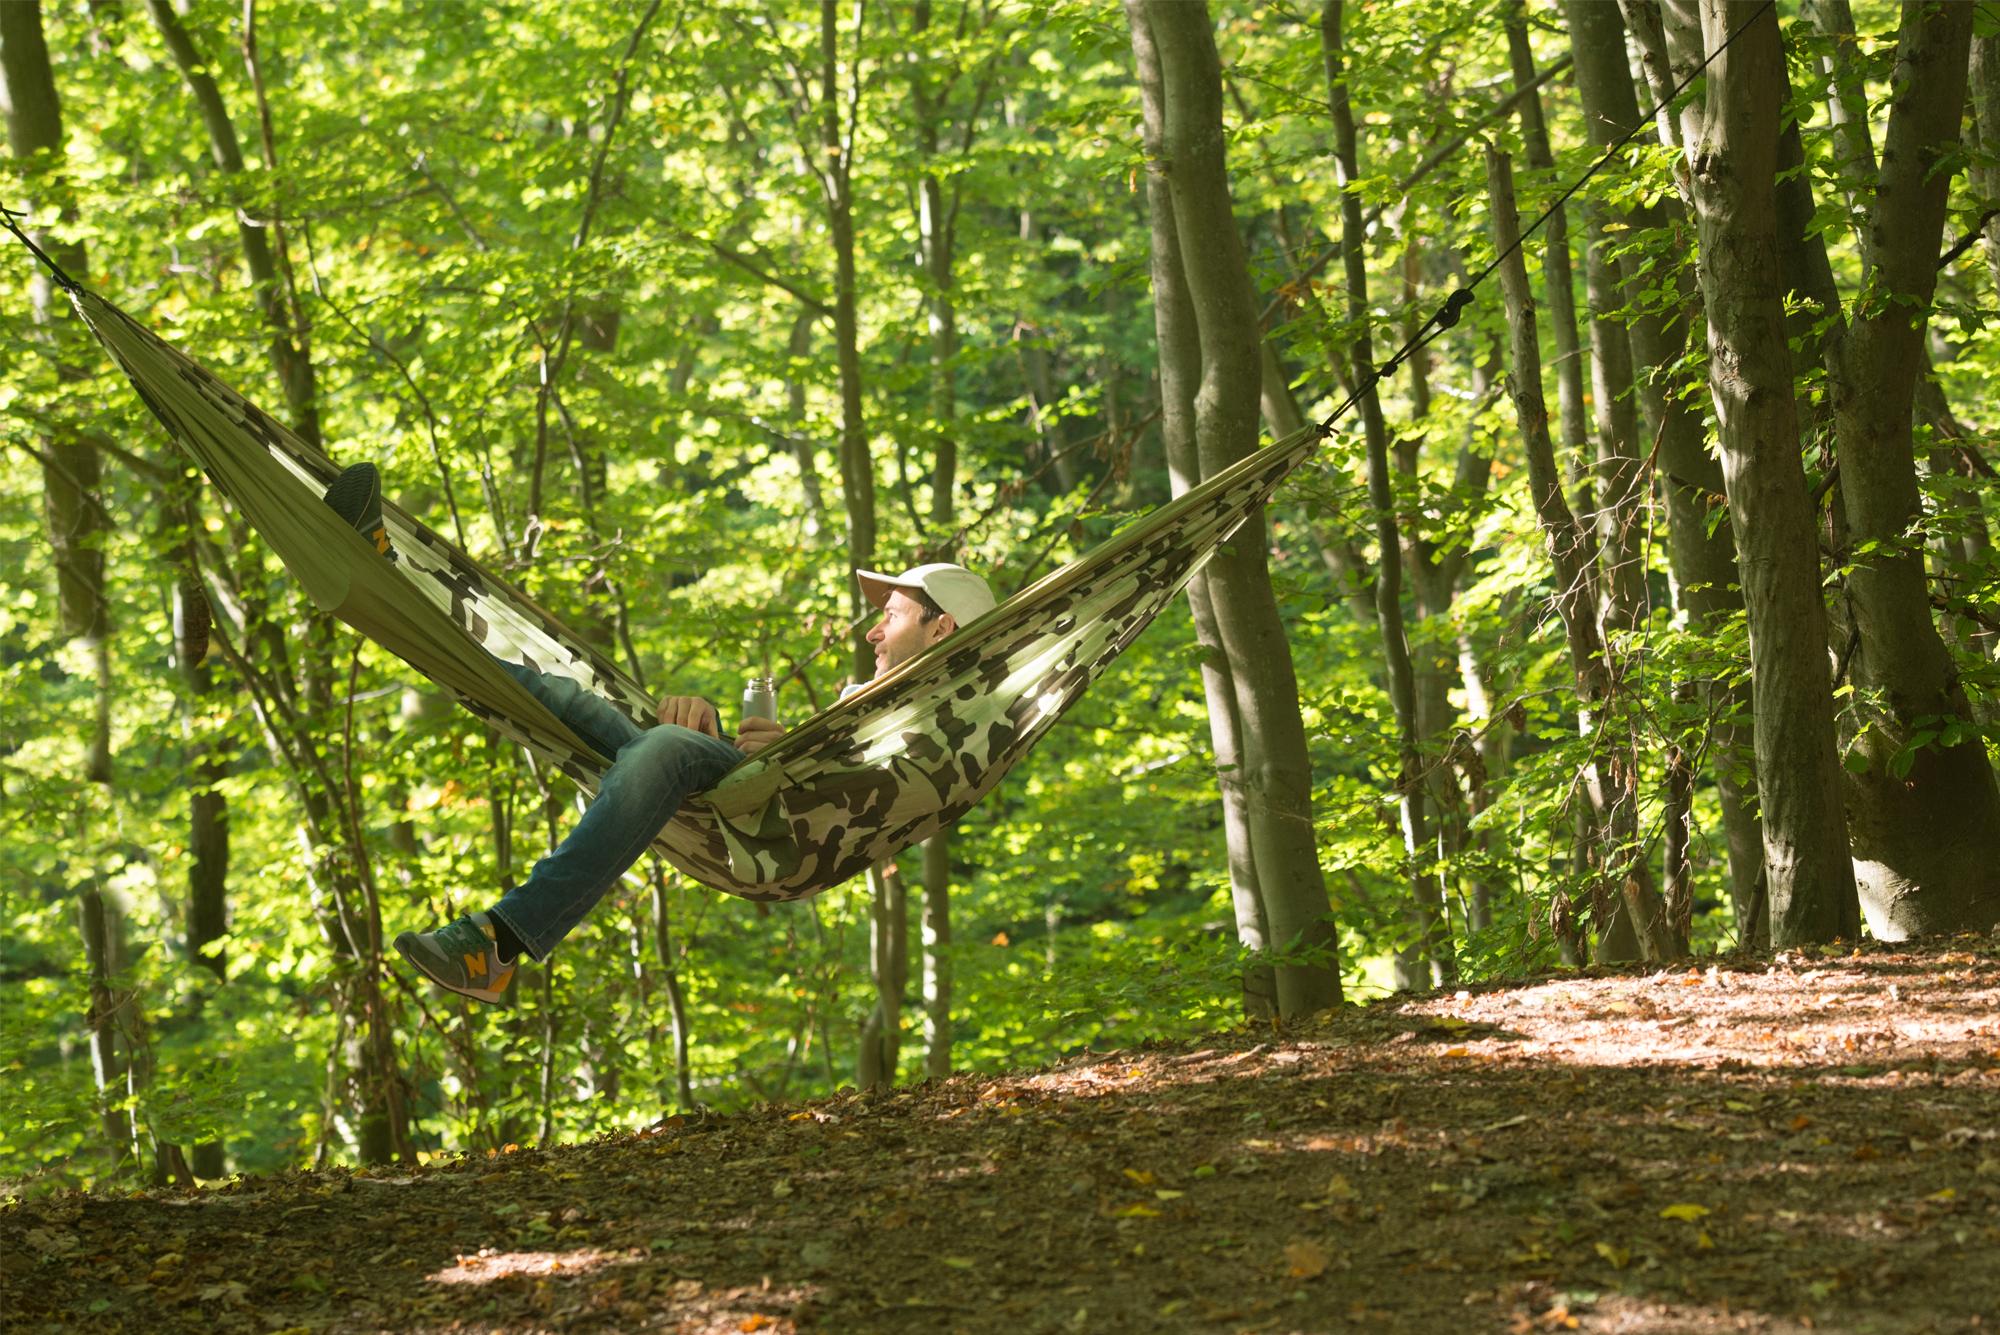 Reishangmat 'Colibri' forest dubbel